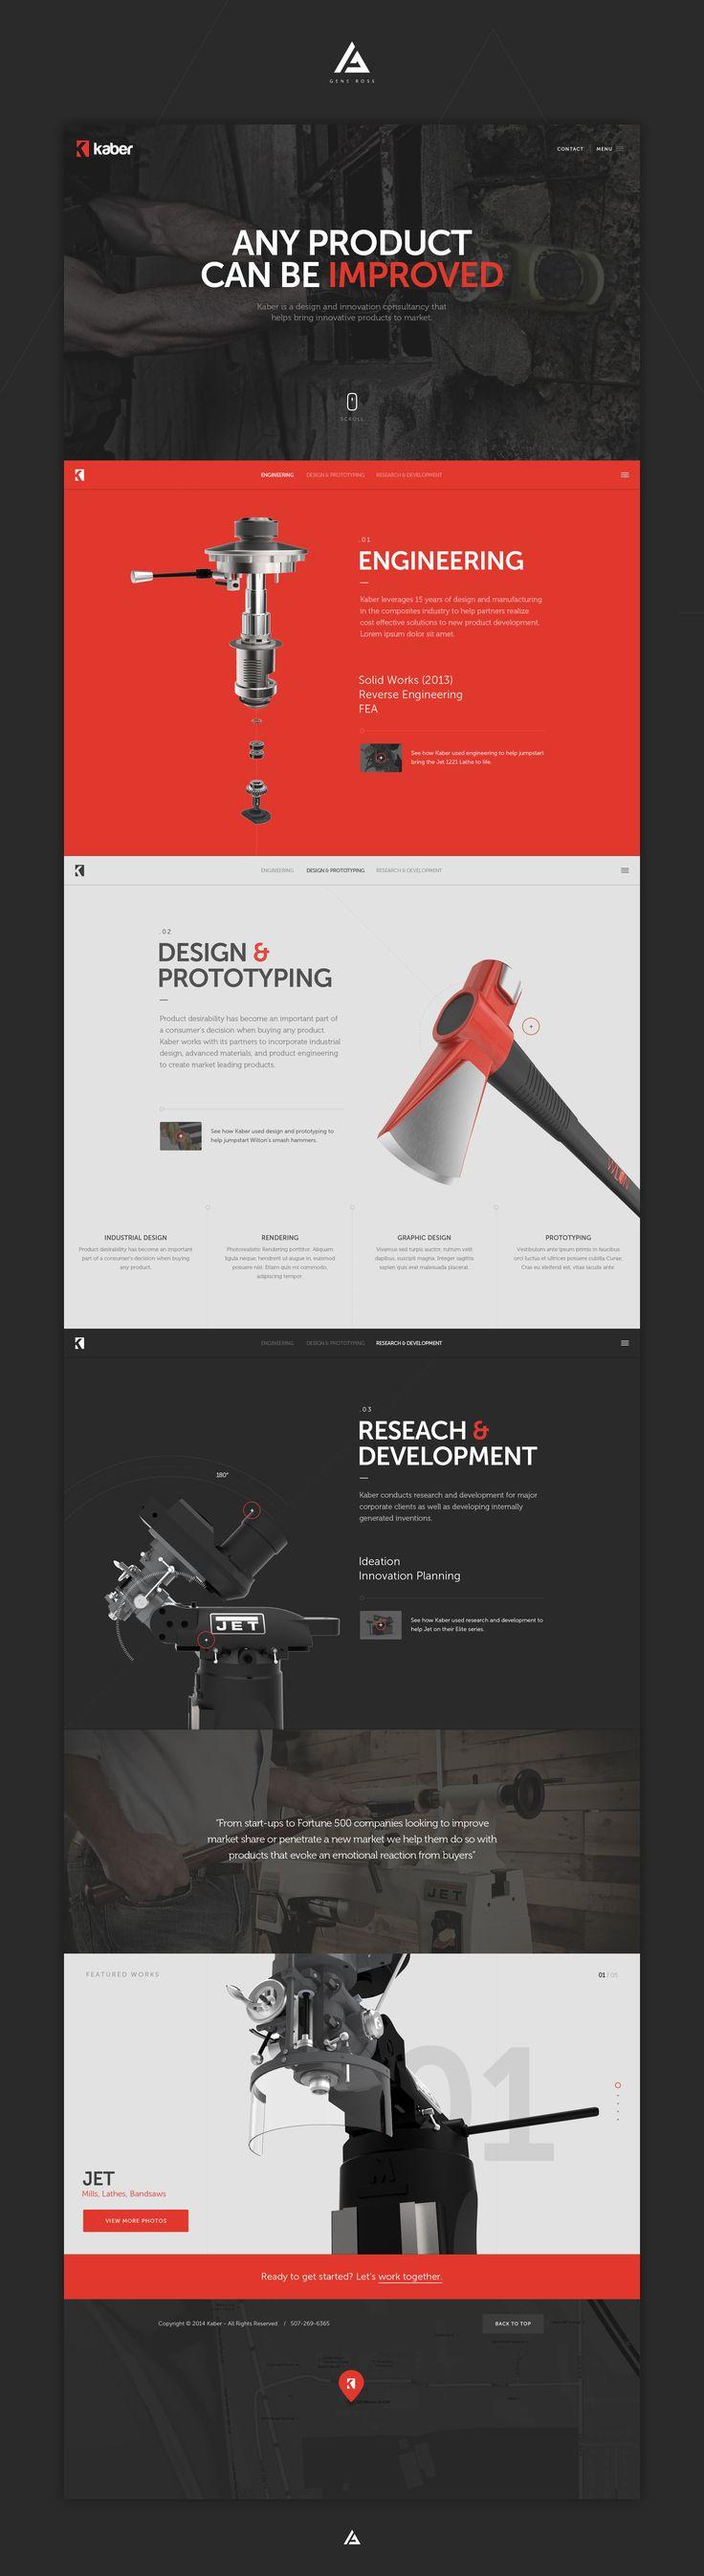 Cool Web Design, kaber. #webdesign #webdevelopment